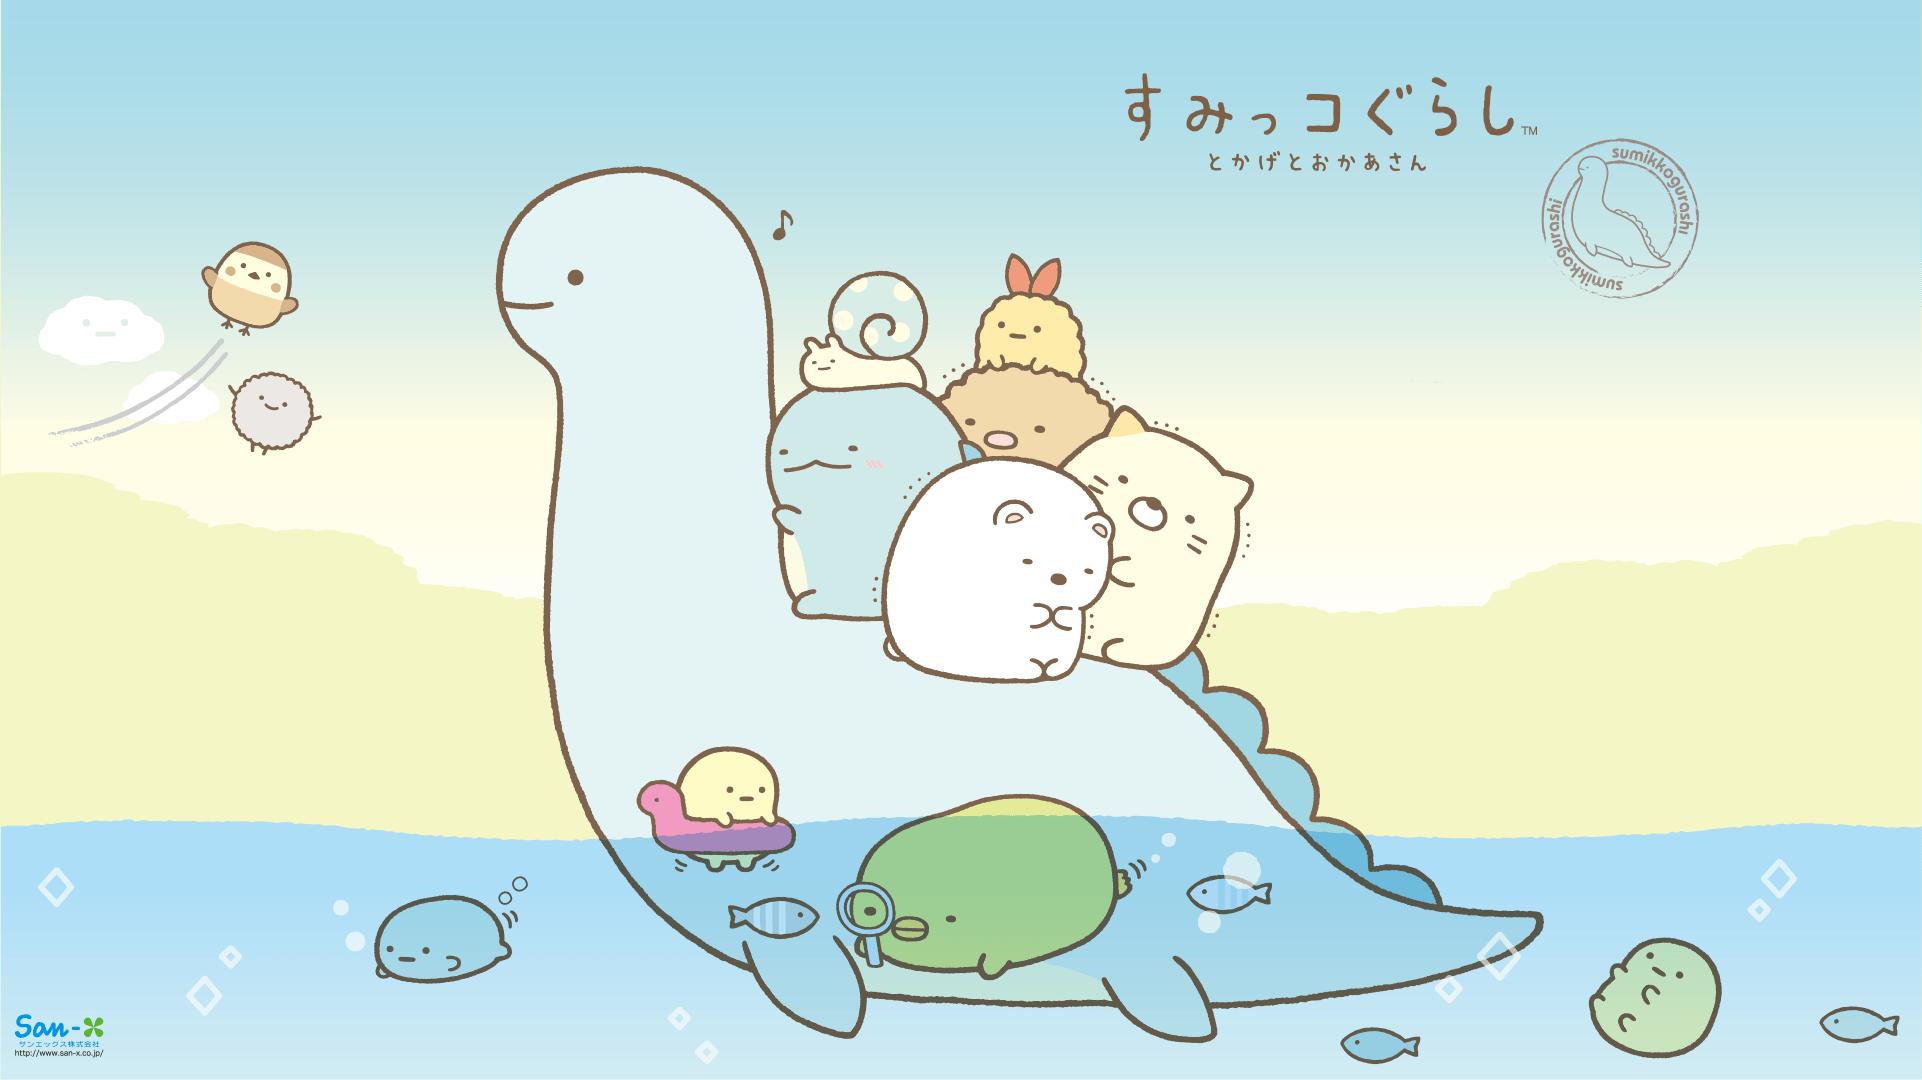 sumikkogurashi marine series wallpaper - photo #5